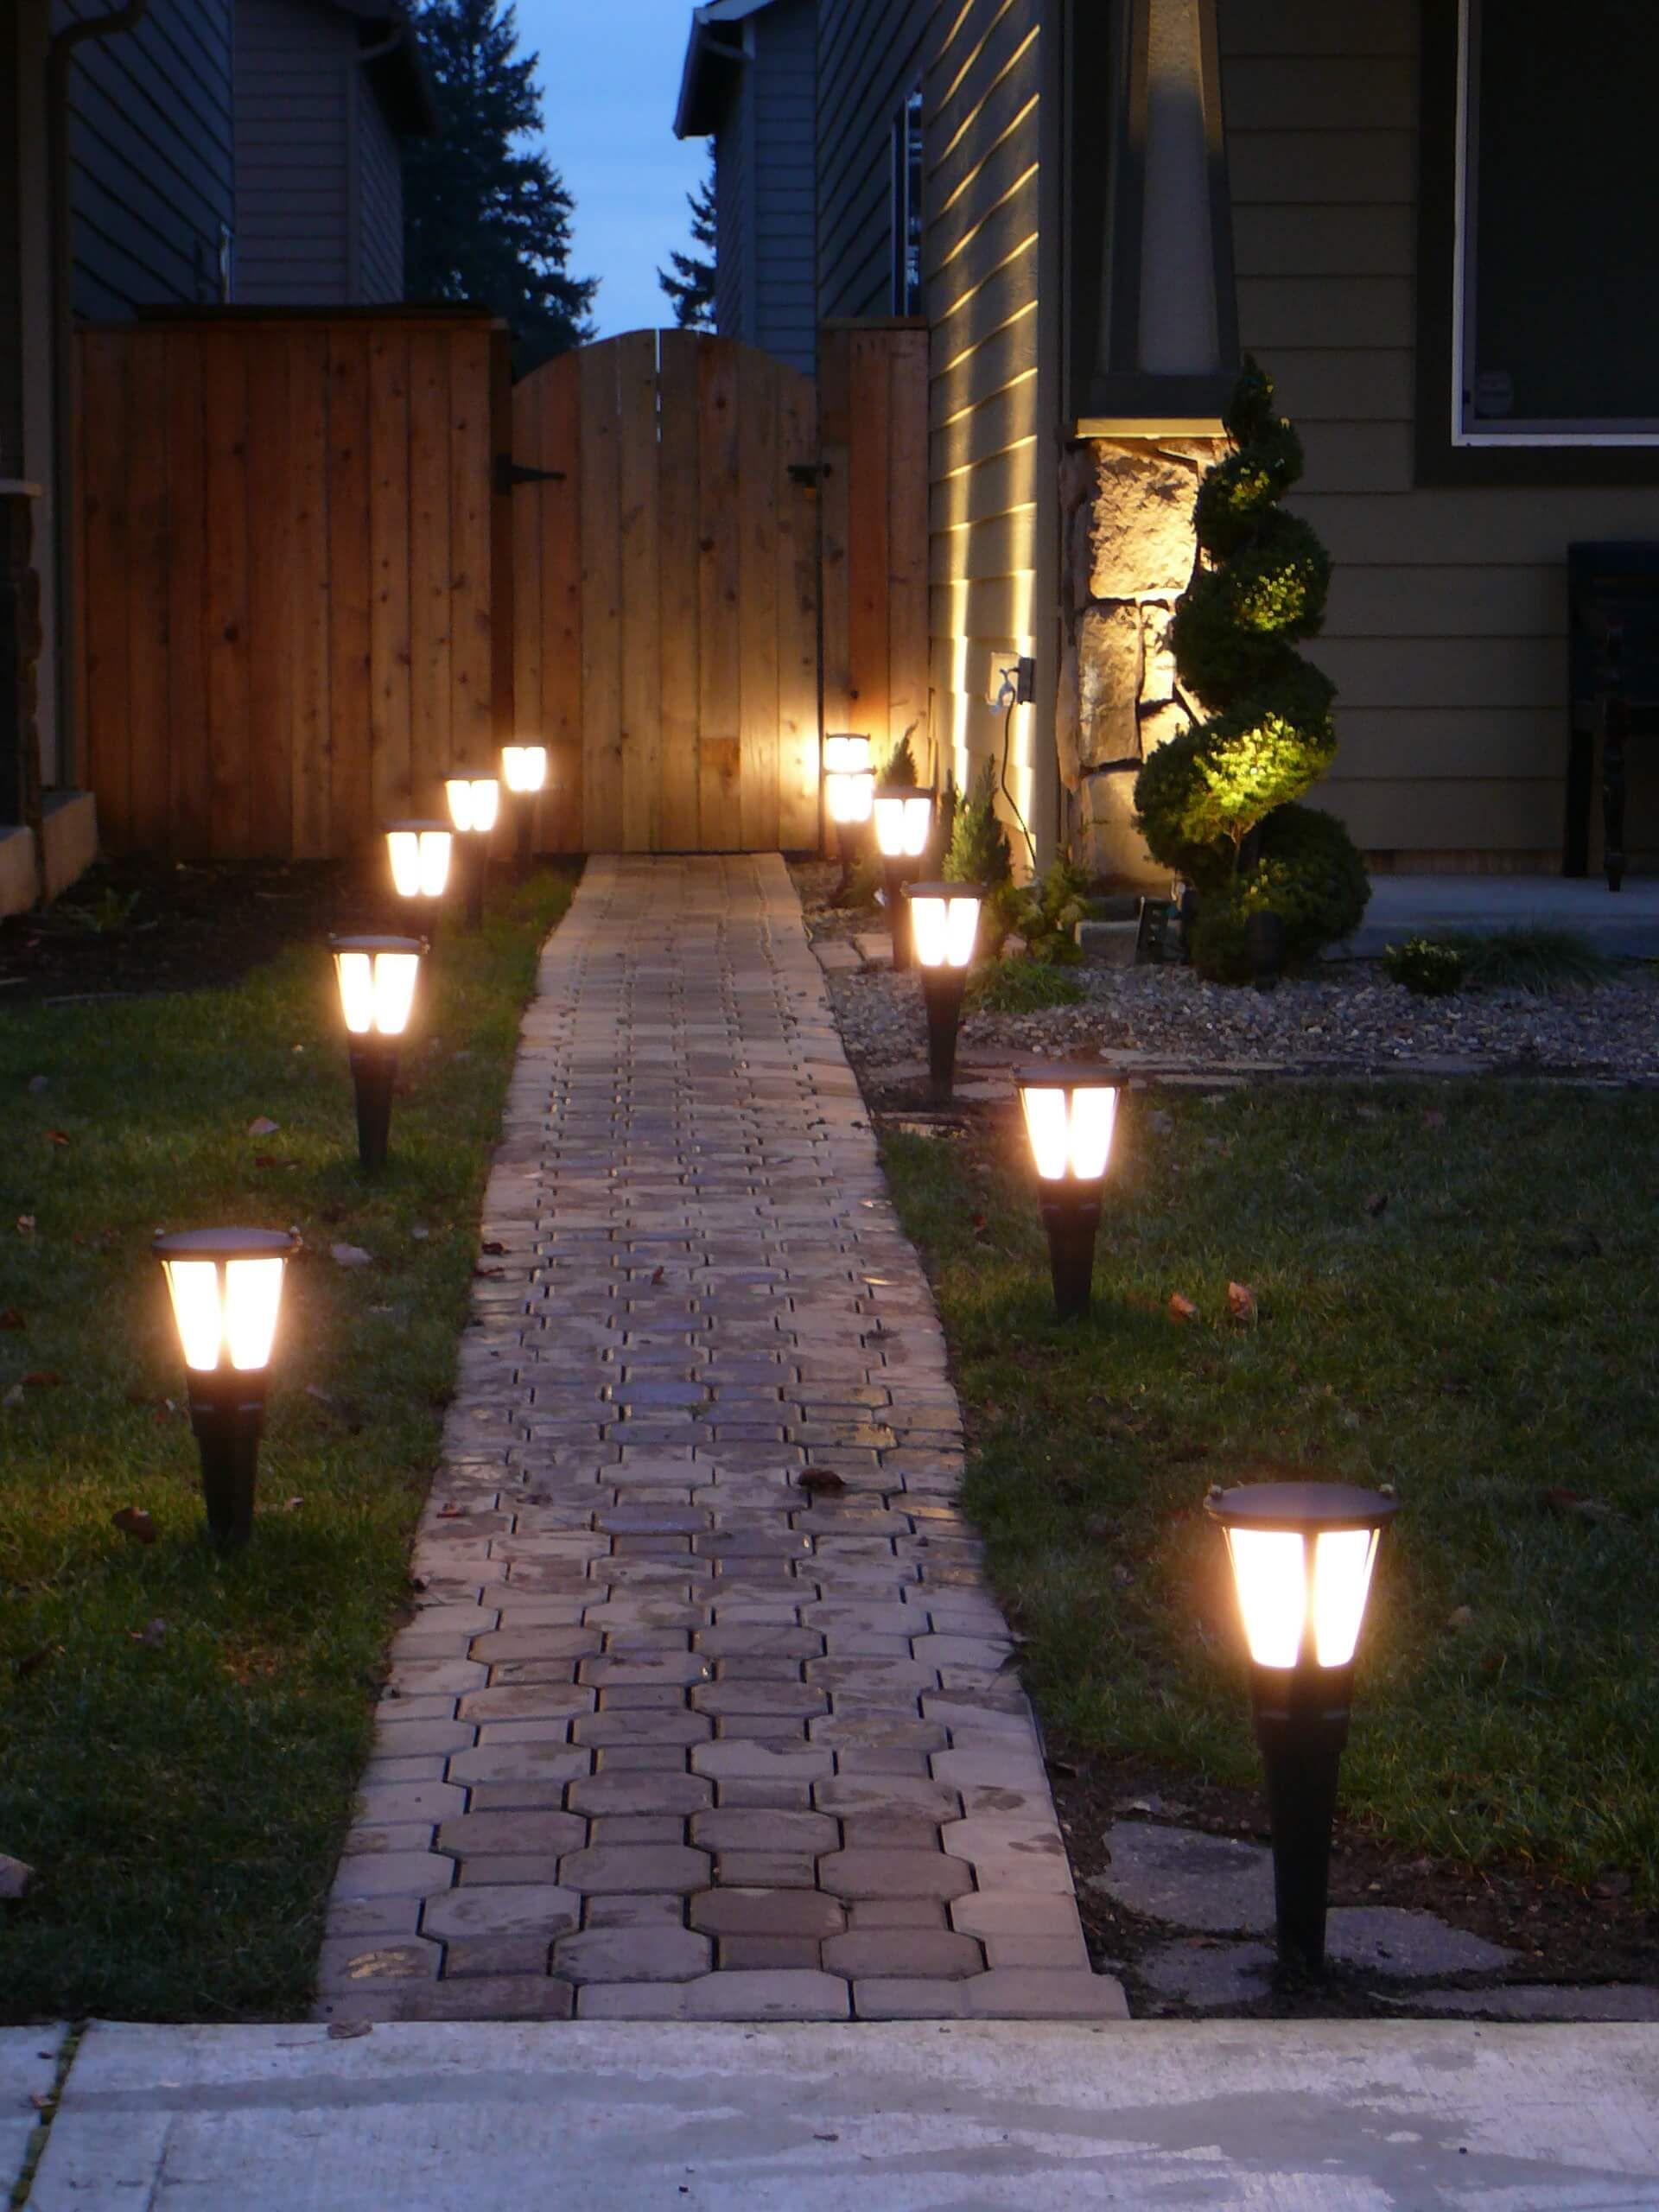 27 Pretty Backyard Lighting Ideas For Your Home Backyard Lighting Outdoor Lighting Design Landscape Lighting Ideas Walkways